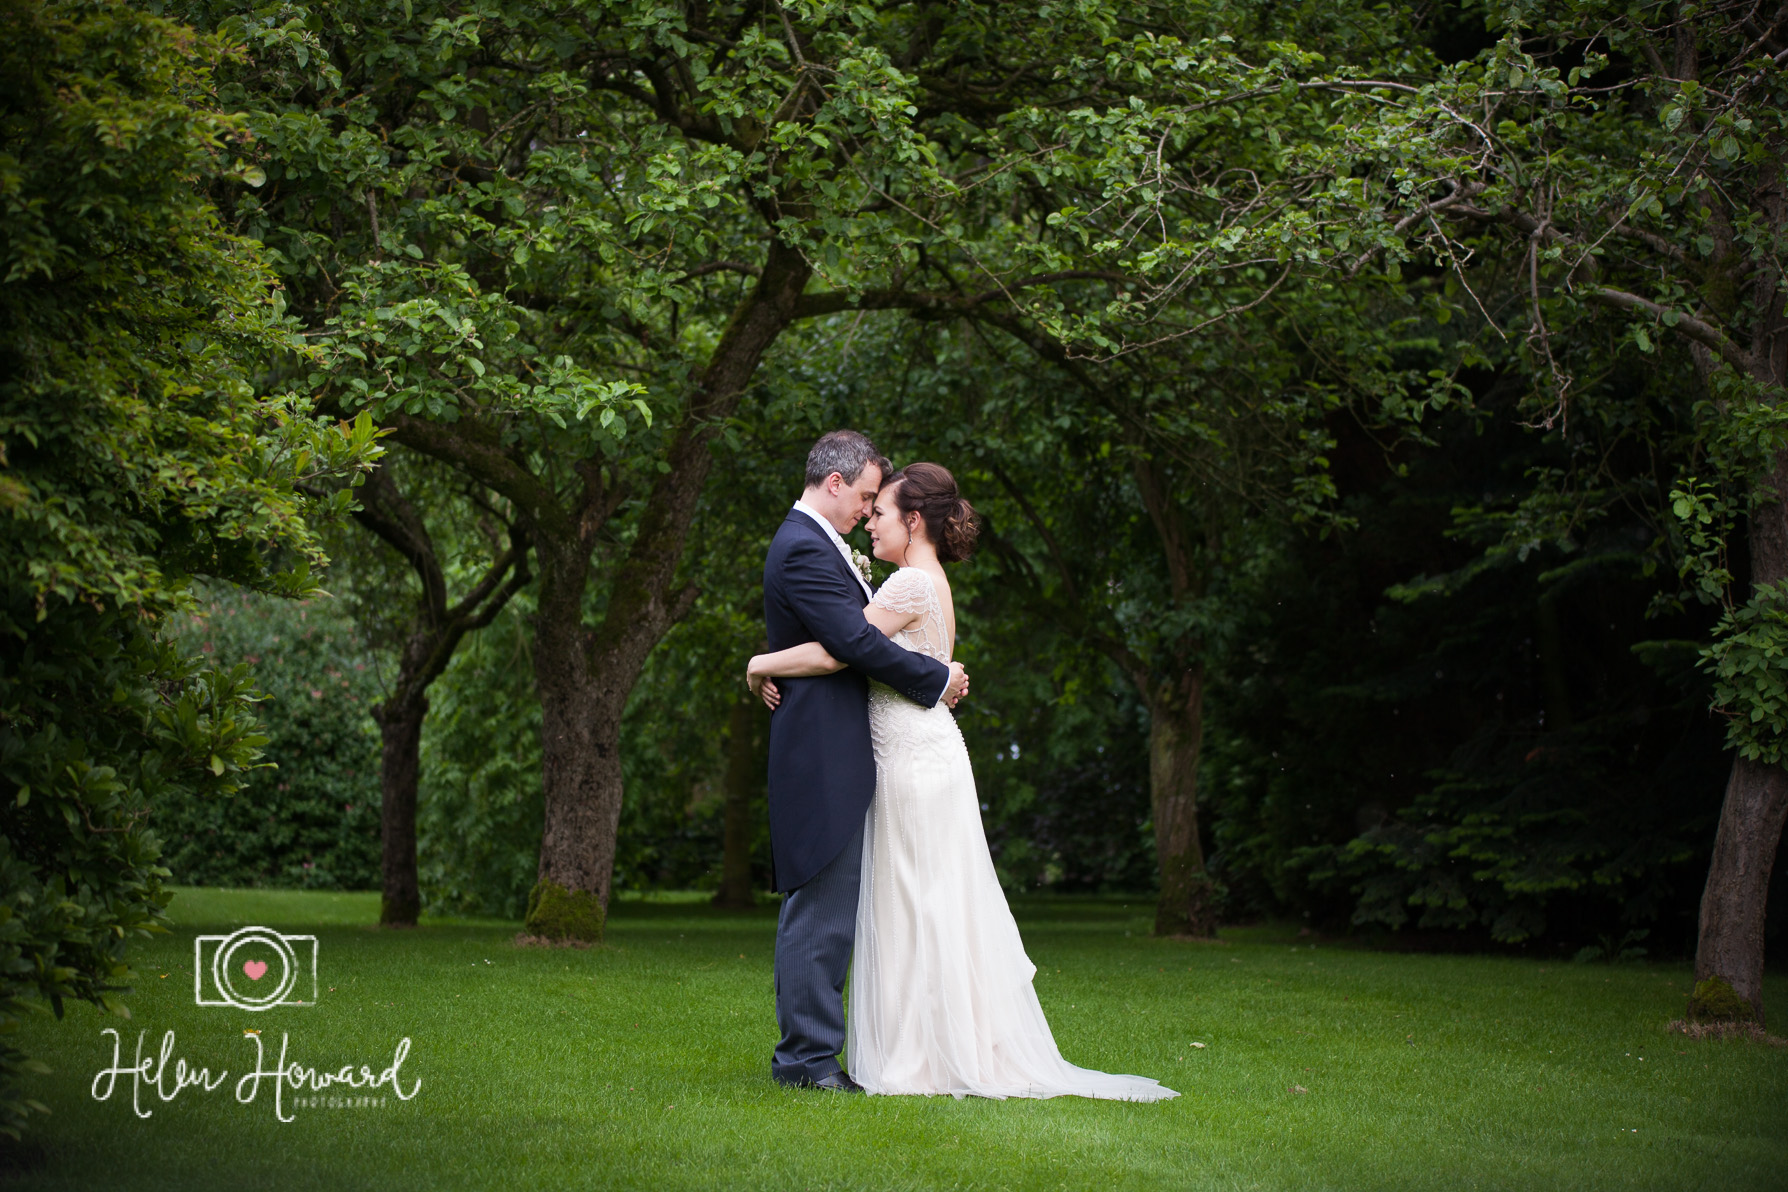 Helen Howard Photography Packington Moor Wedding-108.jpg